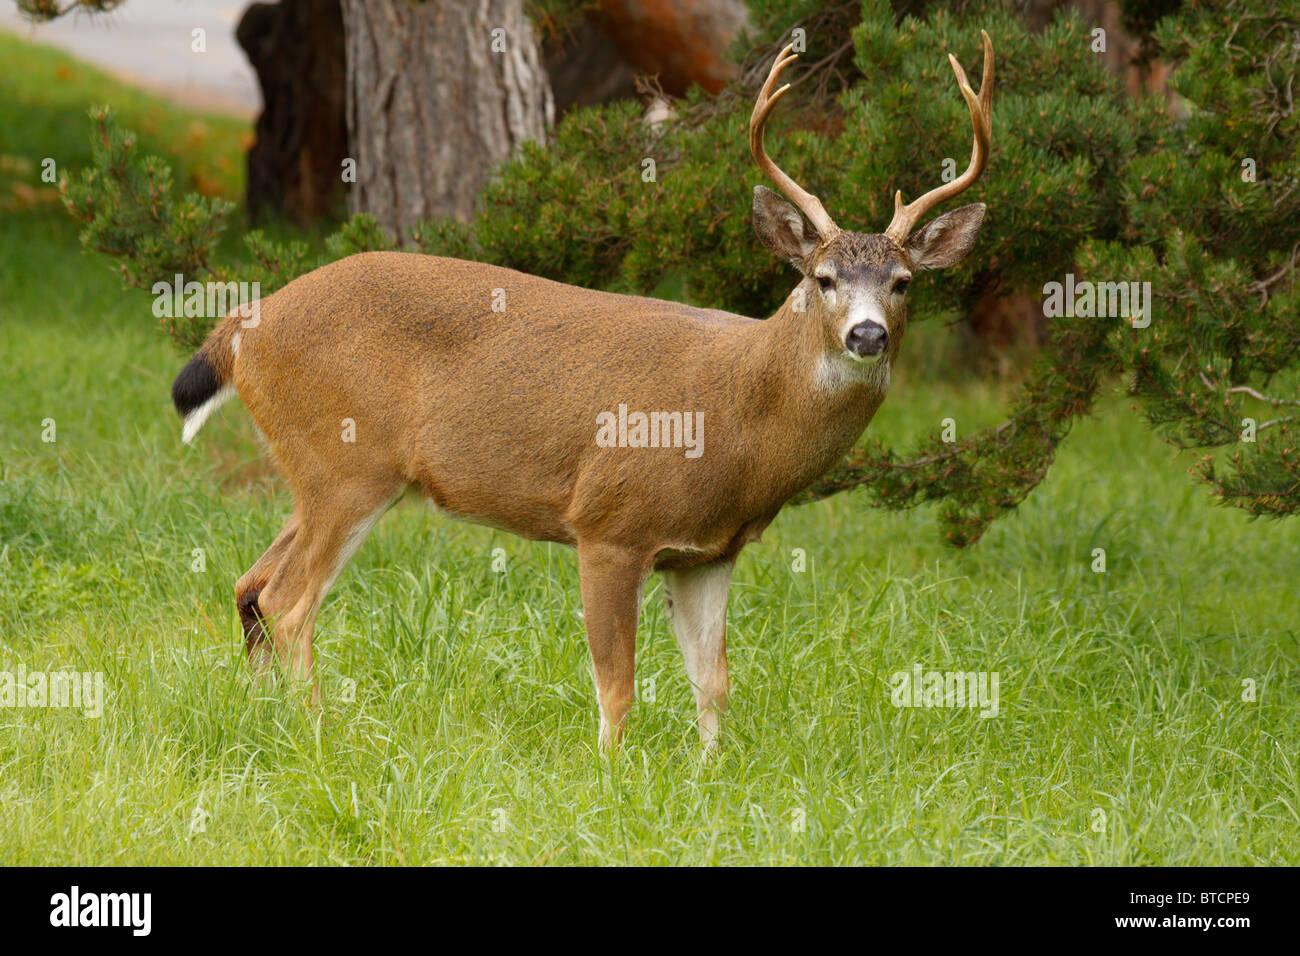 Blacktail deer buck in urban park-Victoria, British Columbia, Canada. - Stock Image